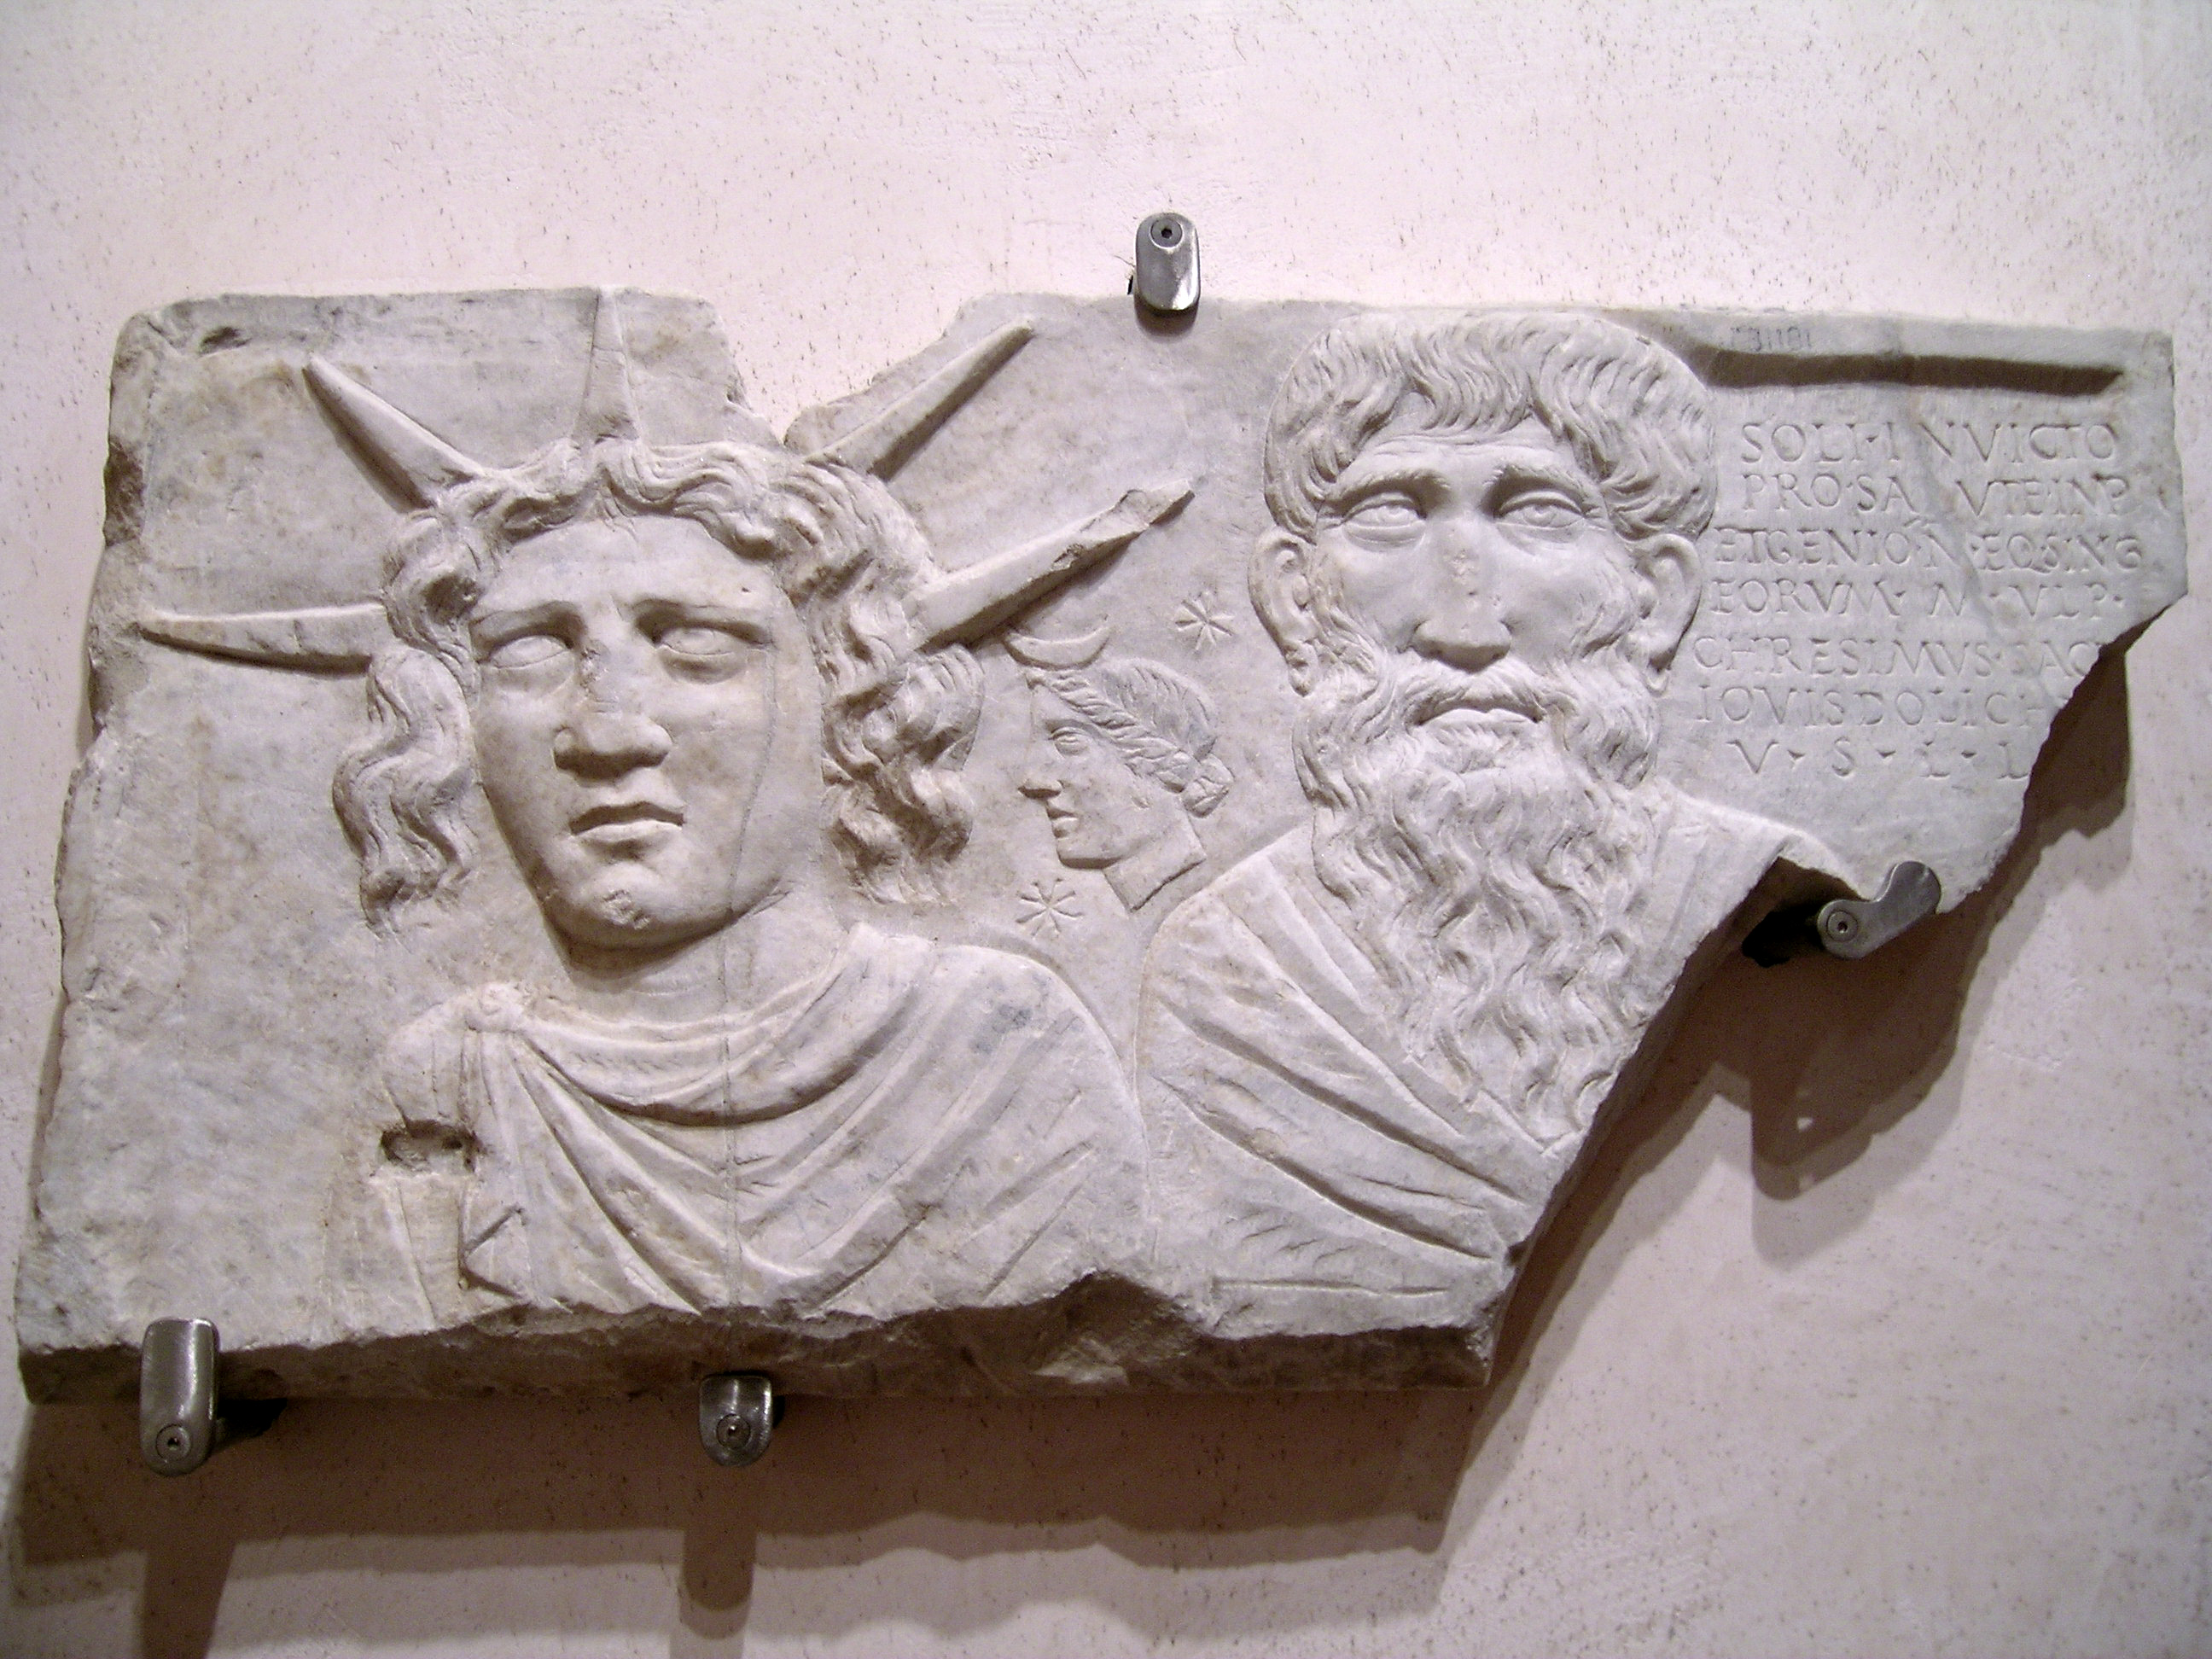 http://upload.wikimedia.org/wikipedia/commons/5/5a/Sol_Invictus_y_J%C3%BApiter_Doliqueno_2m_s_II_CNE.jpg